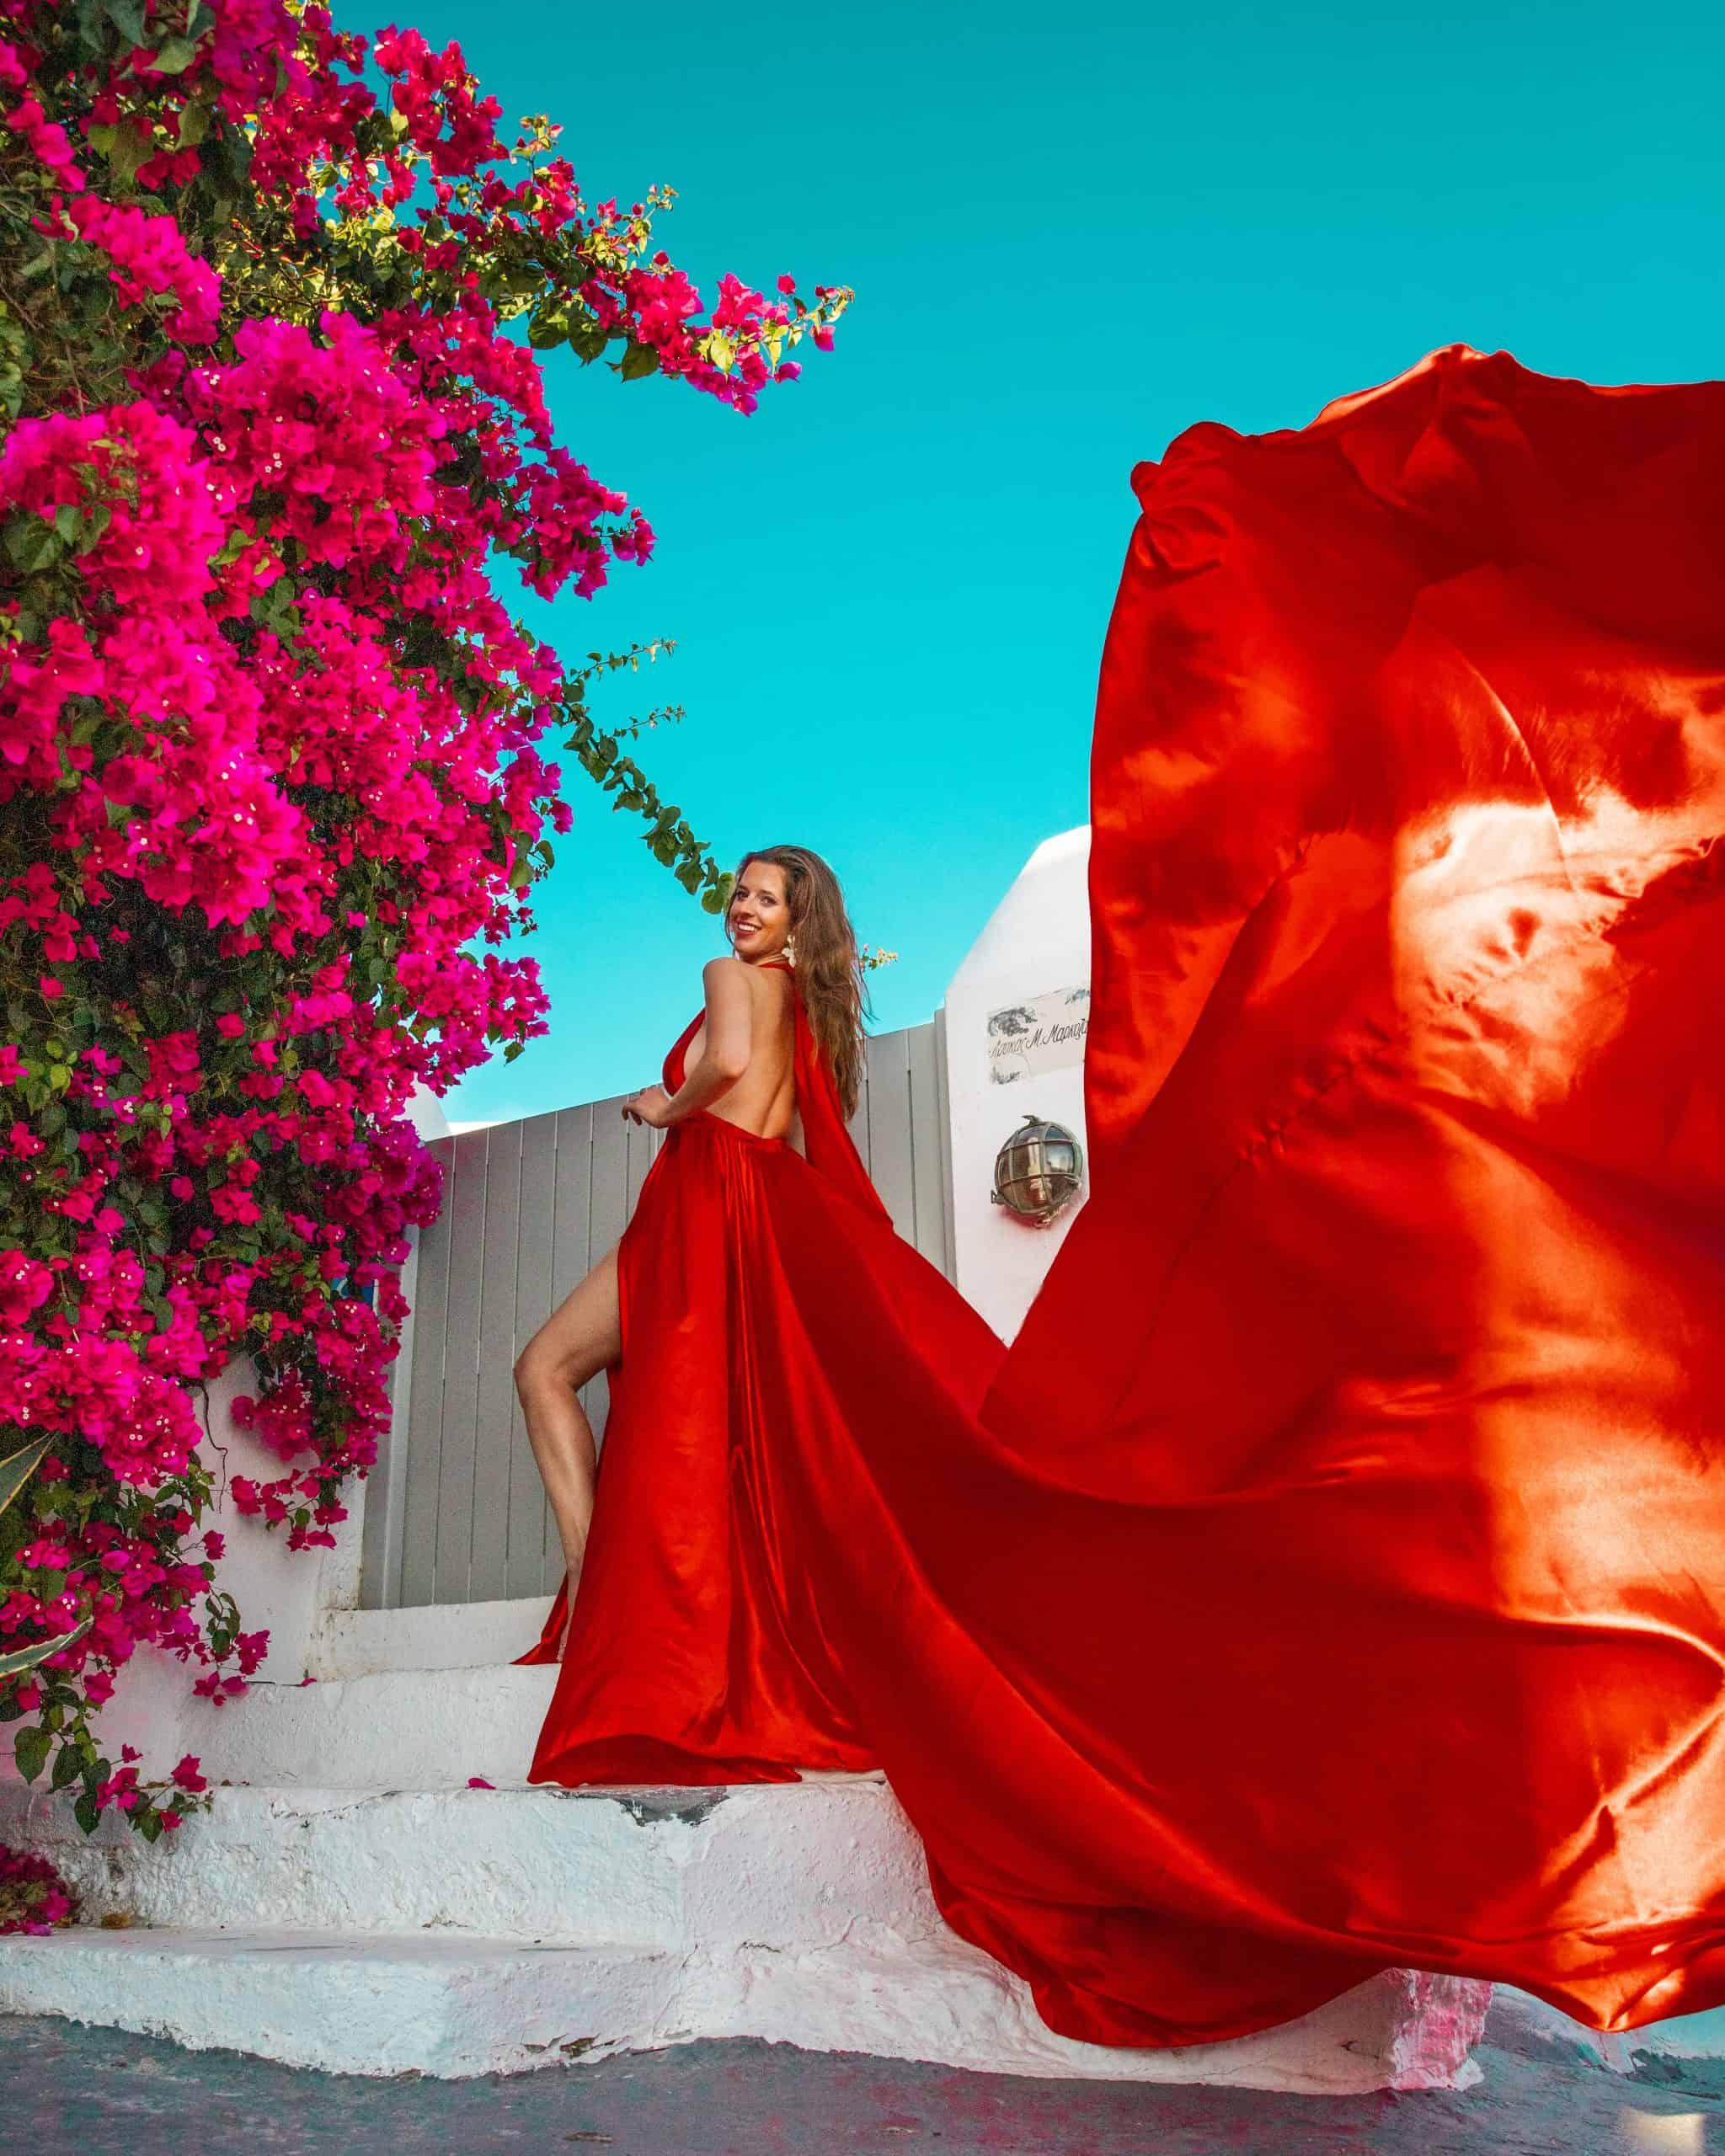 Bettina in Red Dress at Pink Tree (Bougainvillea Tree) in Imerovigli, Santorini